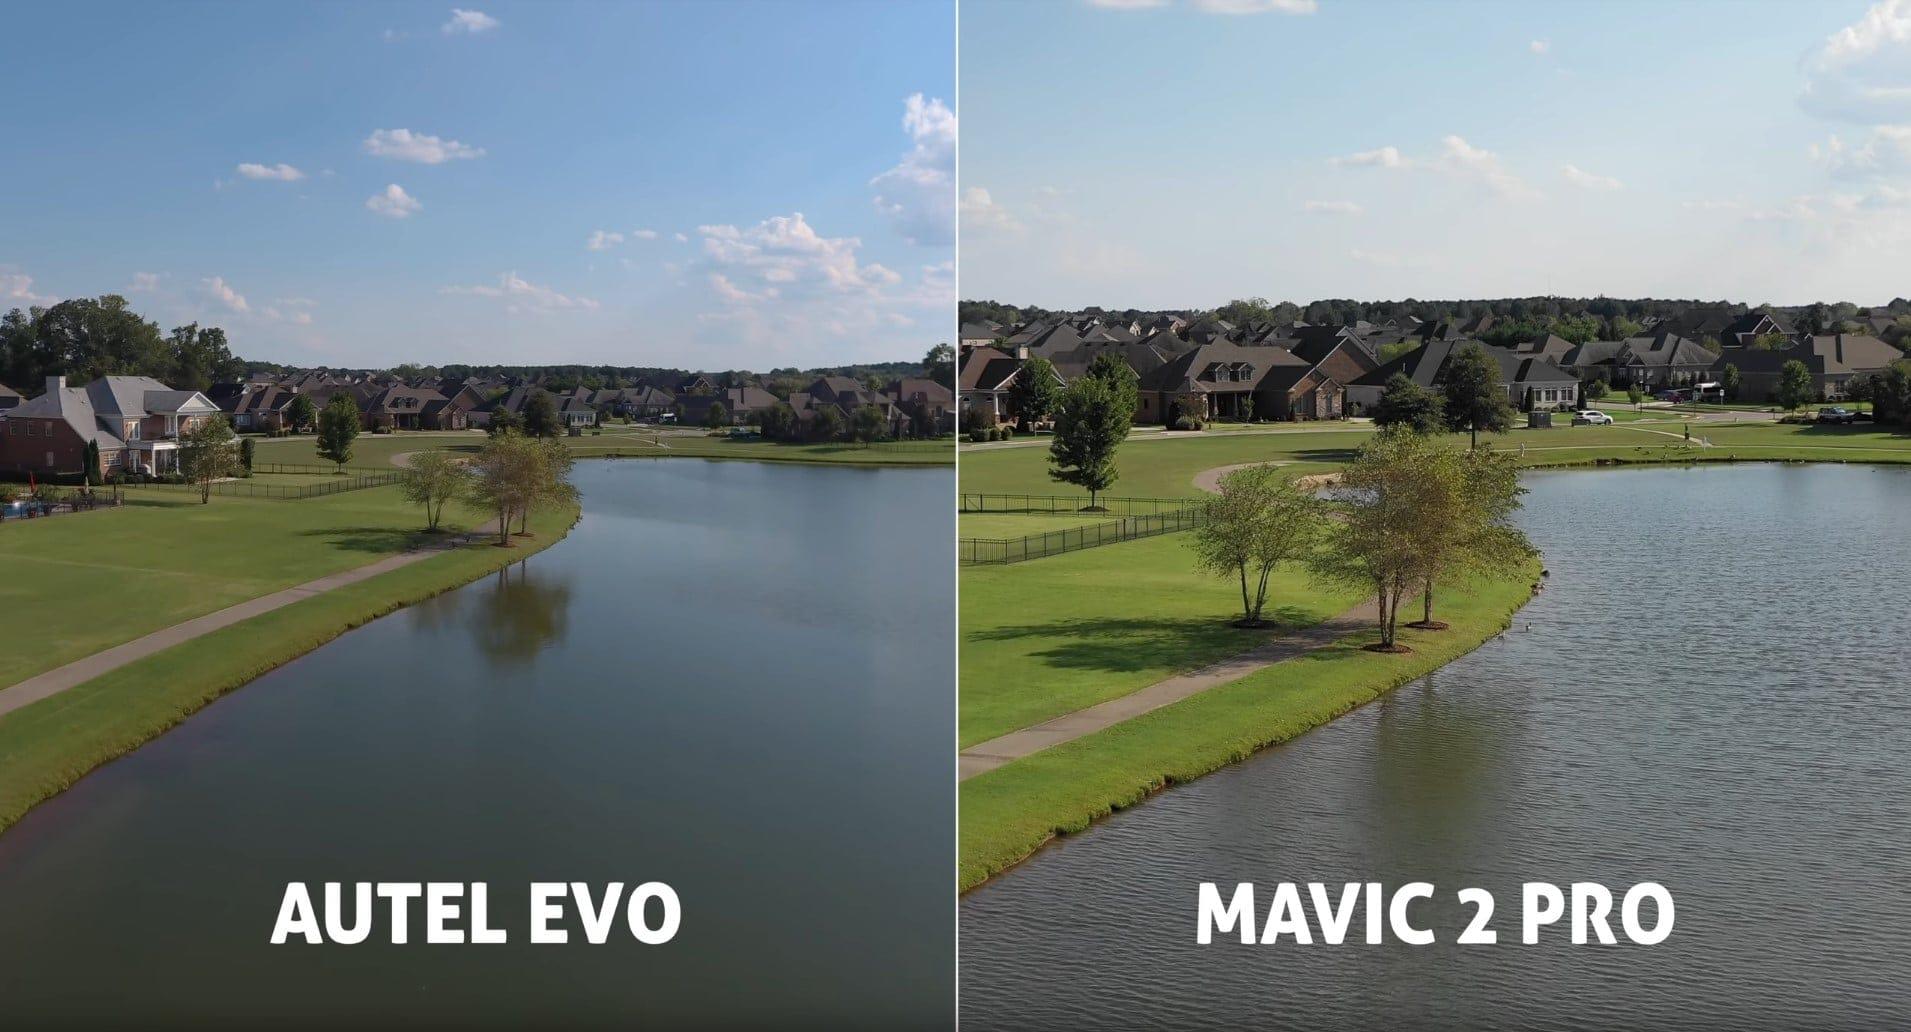 autel evo vs Mavic 2 pro